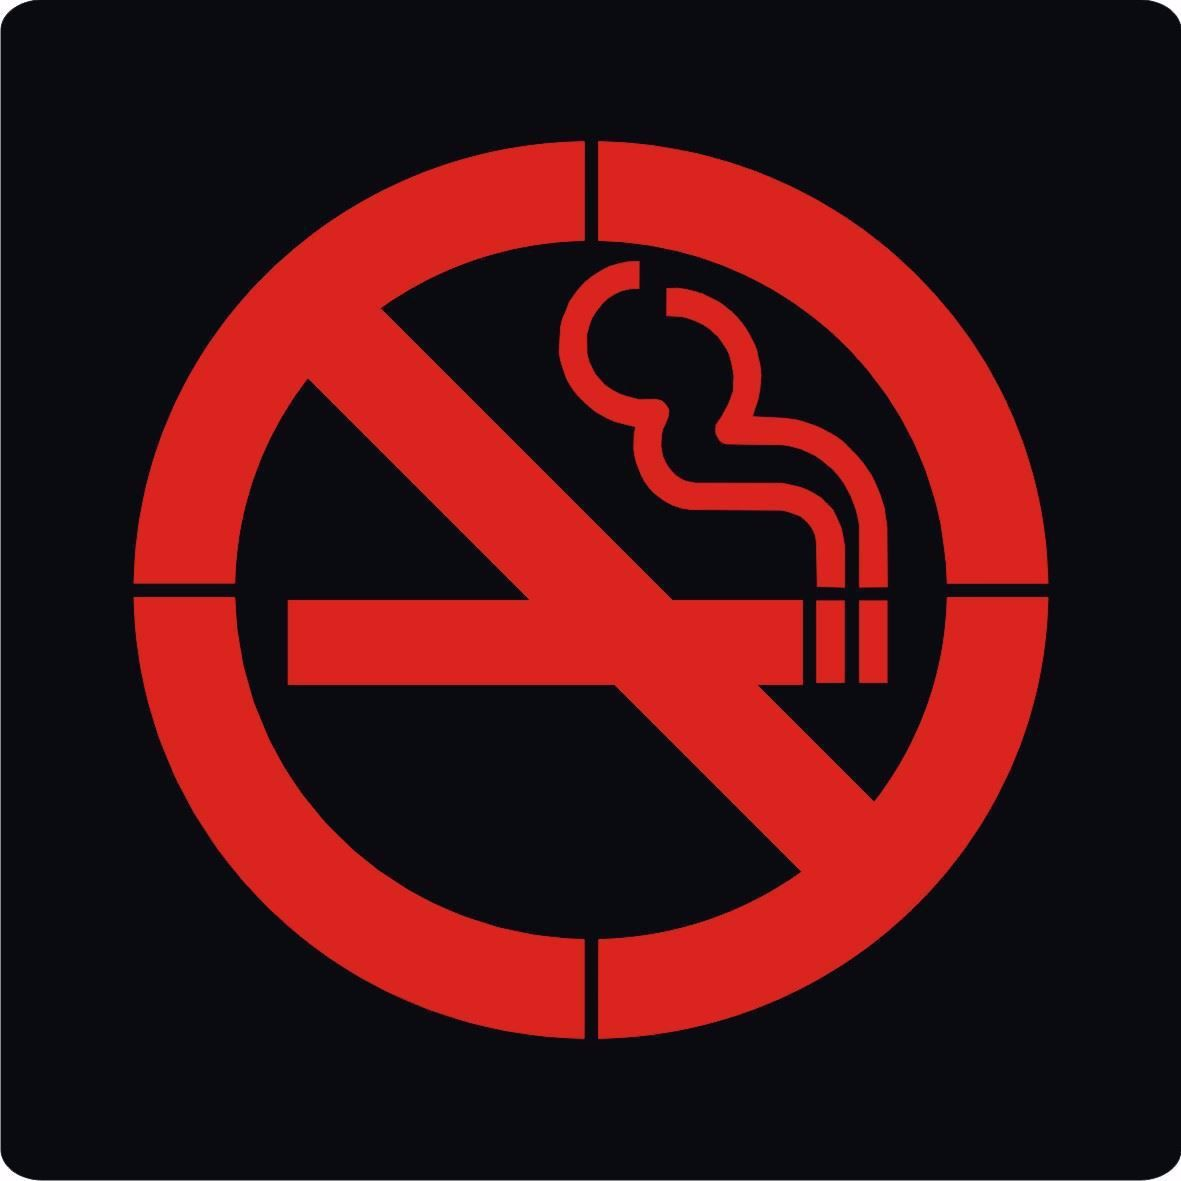 سنگ نورانی مربع ضد آب تک رنگ طرح سیگار ممنوع سایز 10 سانت 12 ولت مدل PL10N